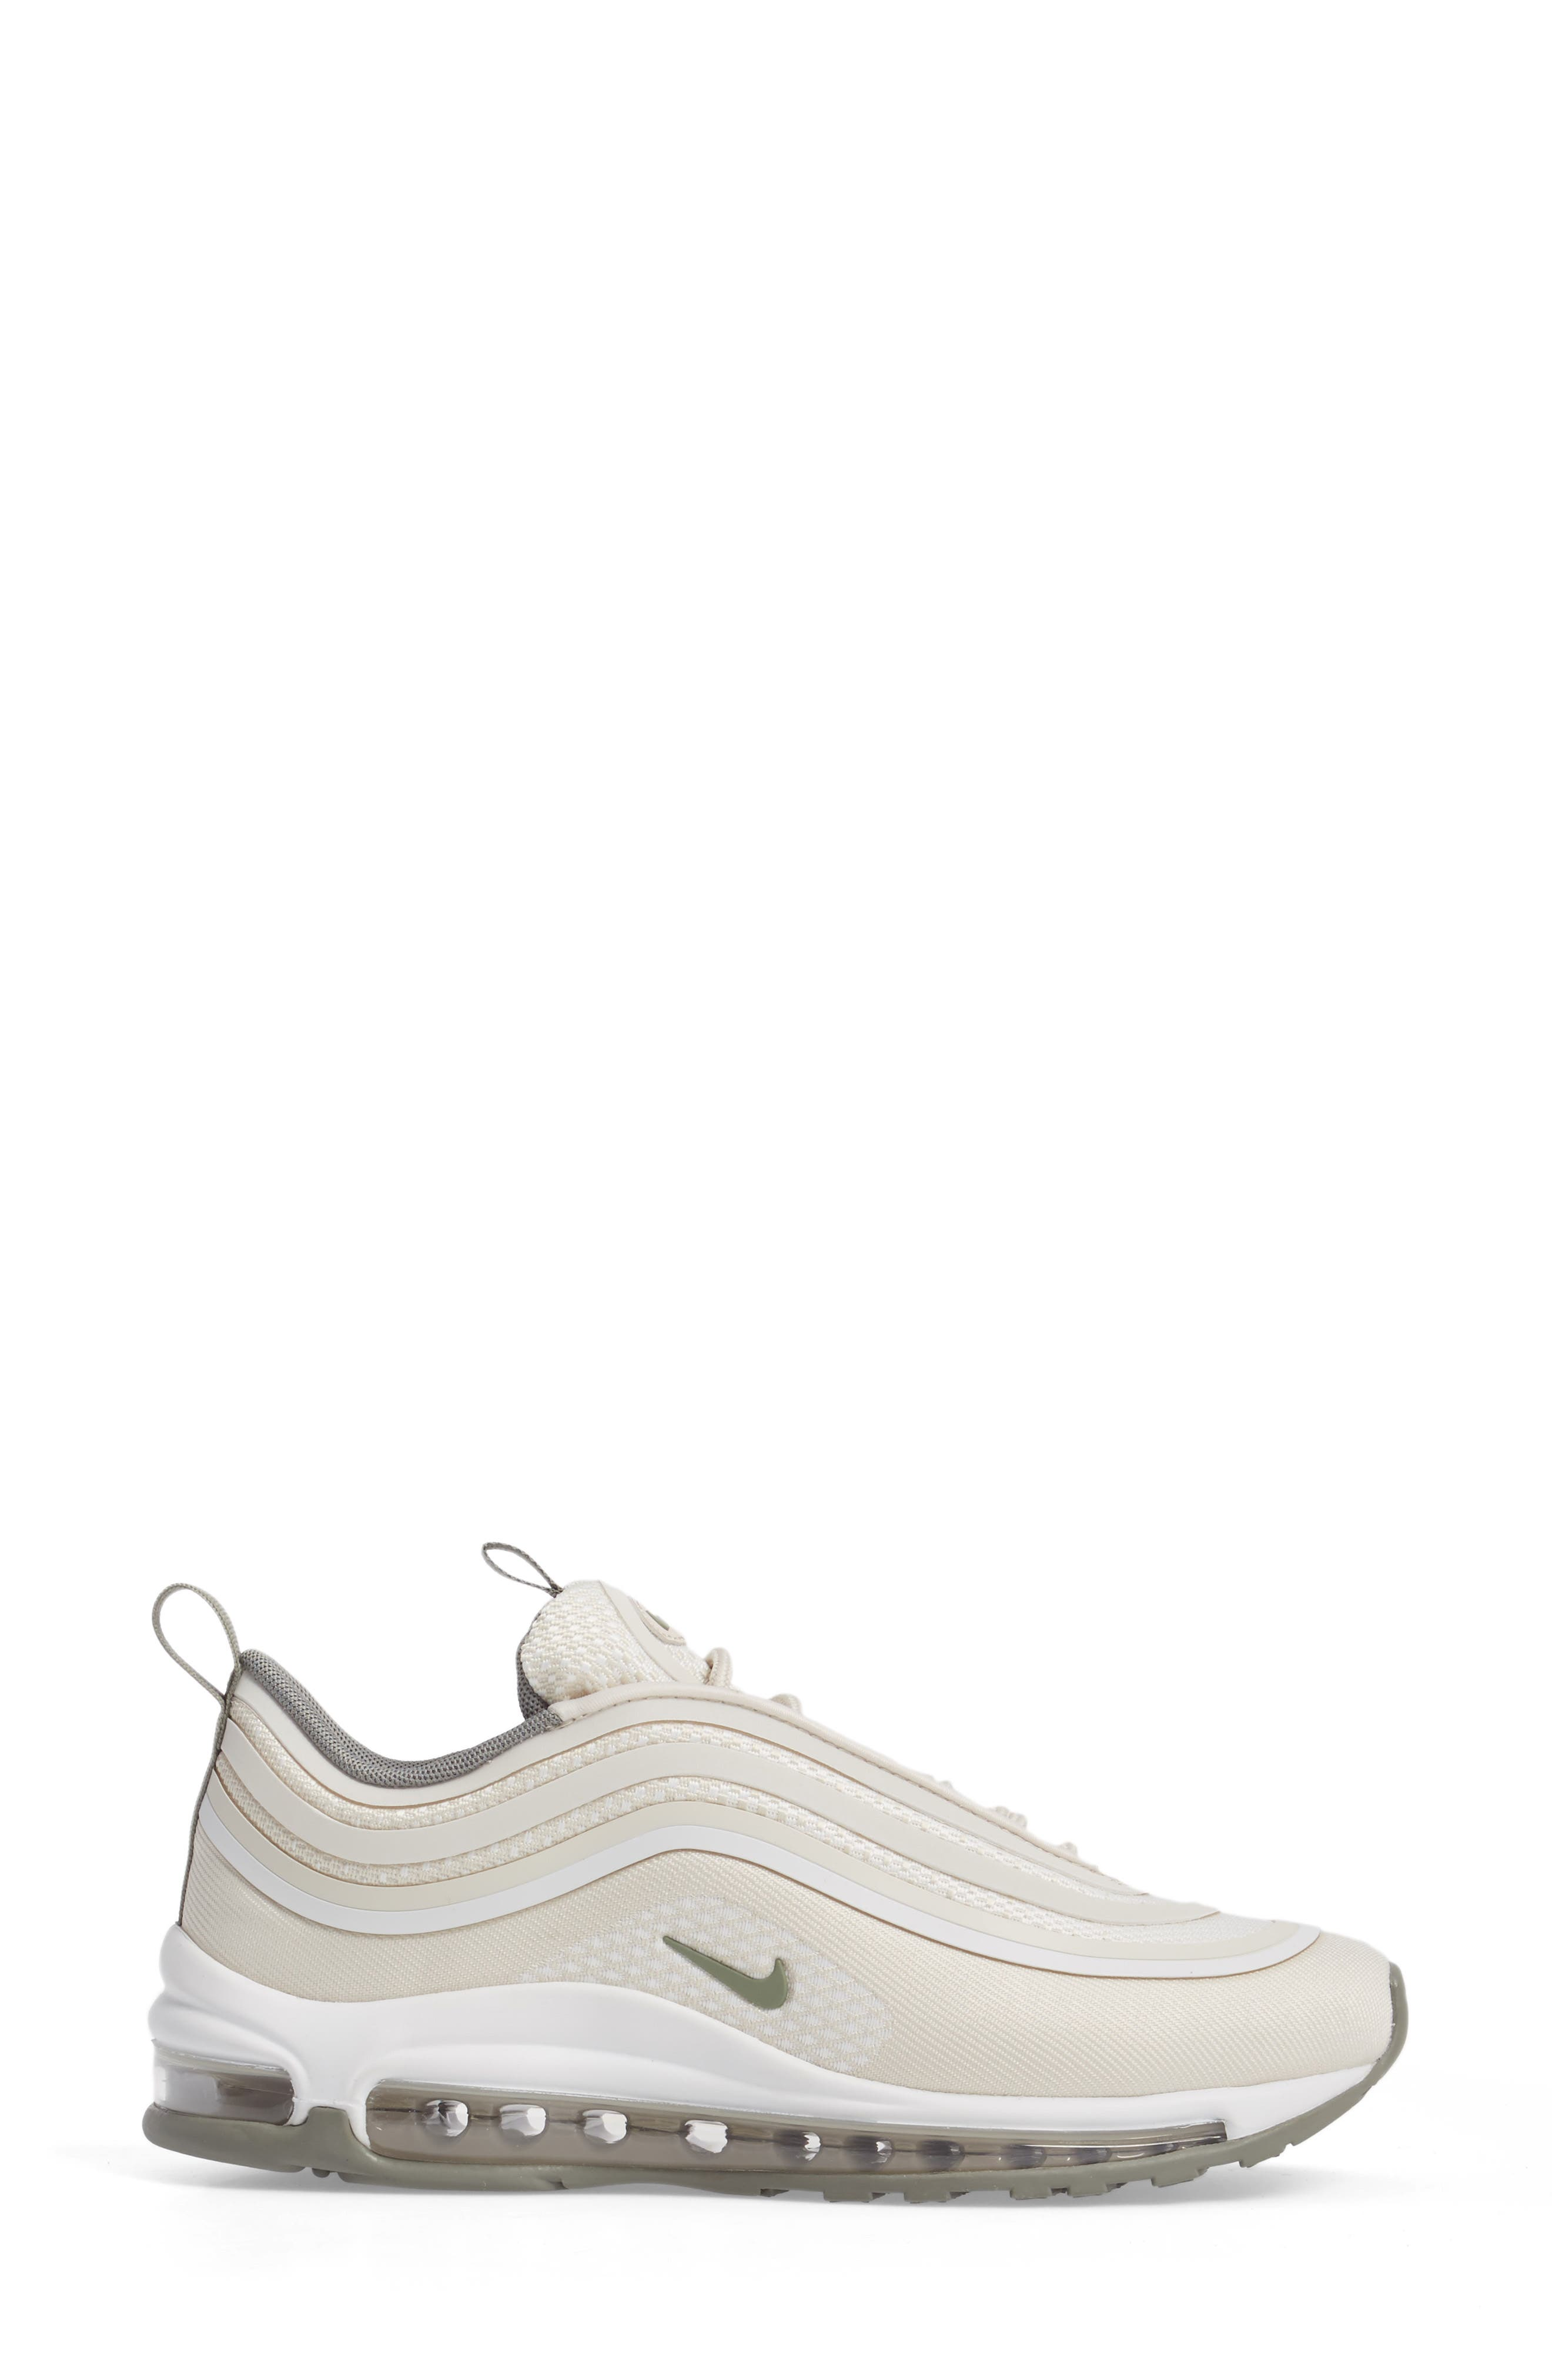 Air Max 97 Ultralight 2017 Sneaker,                             Alternate thumbnail 29, color,